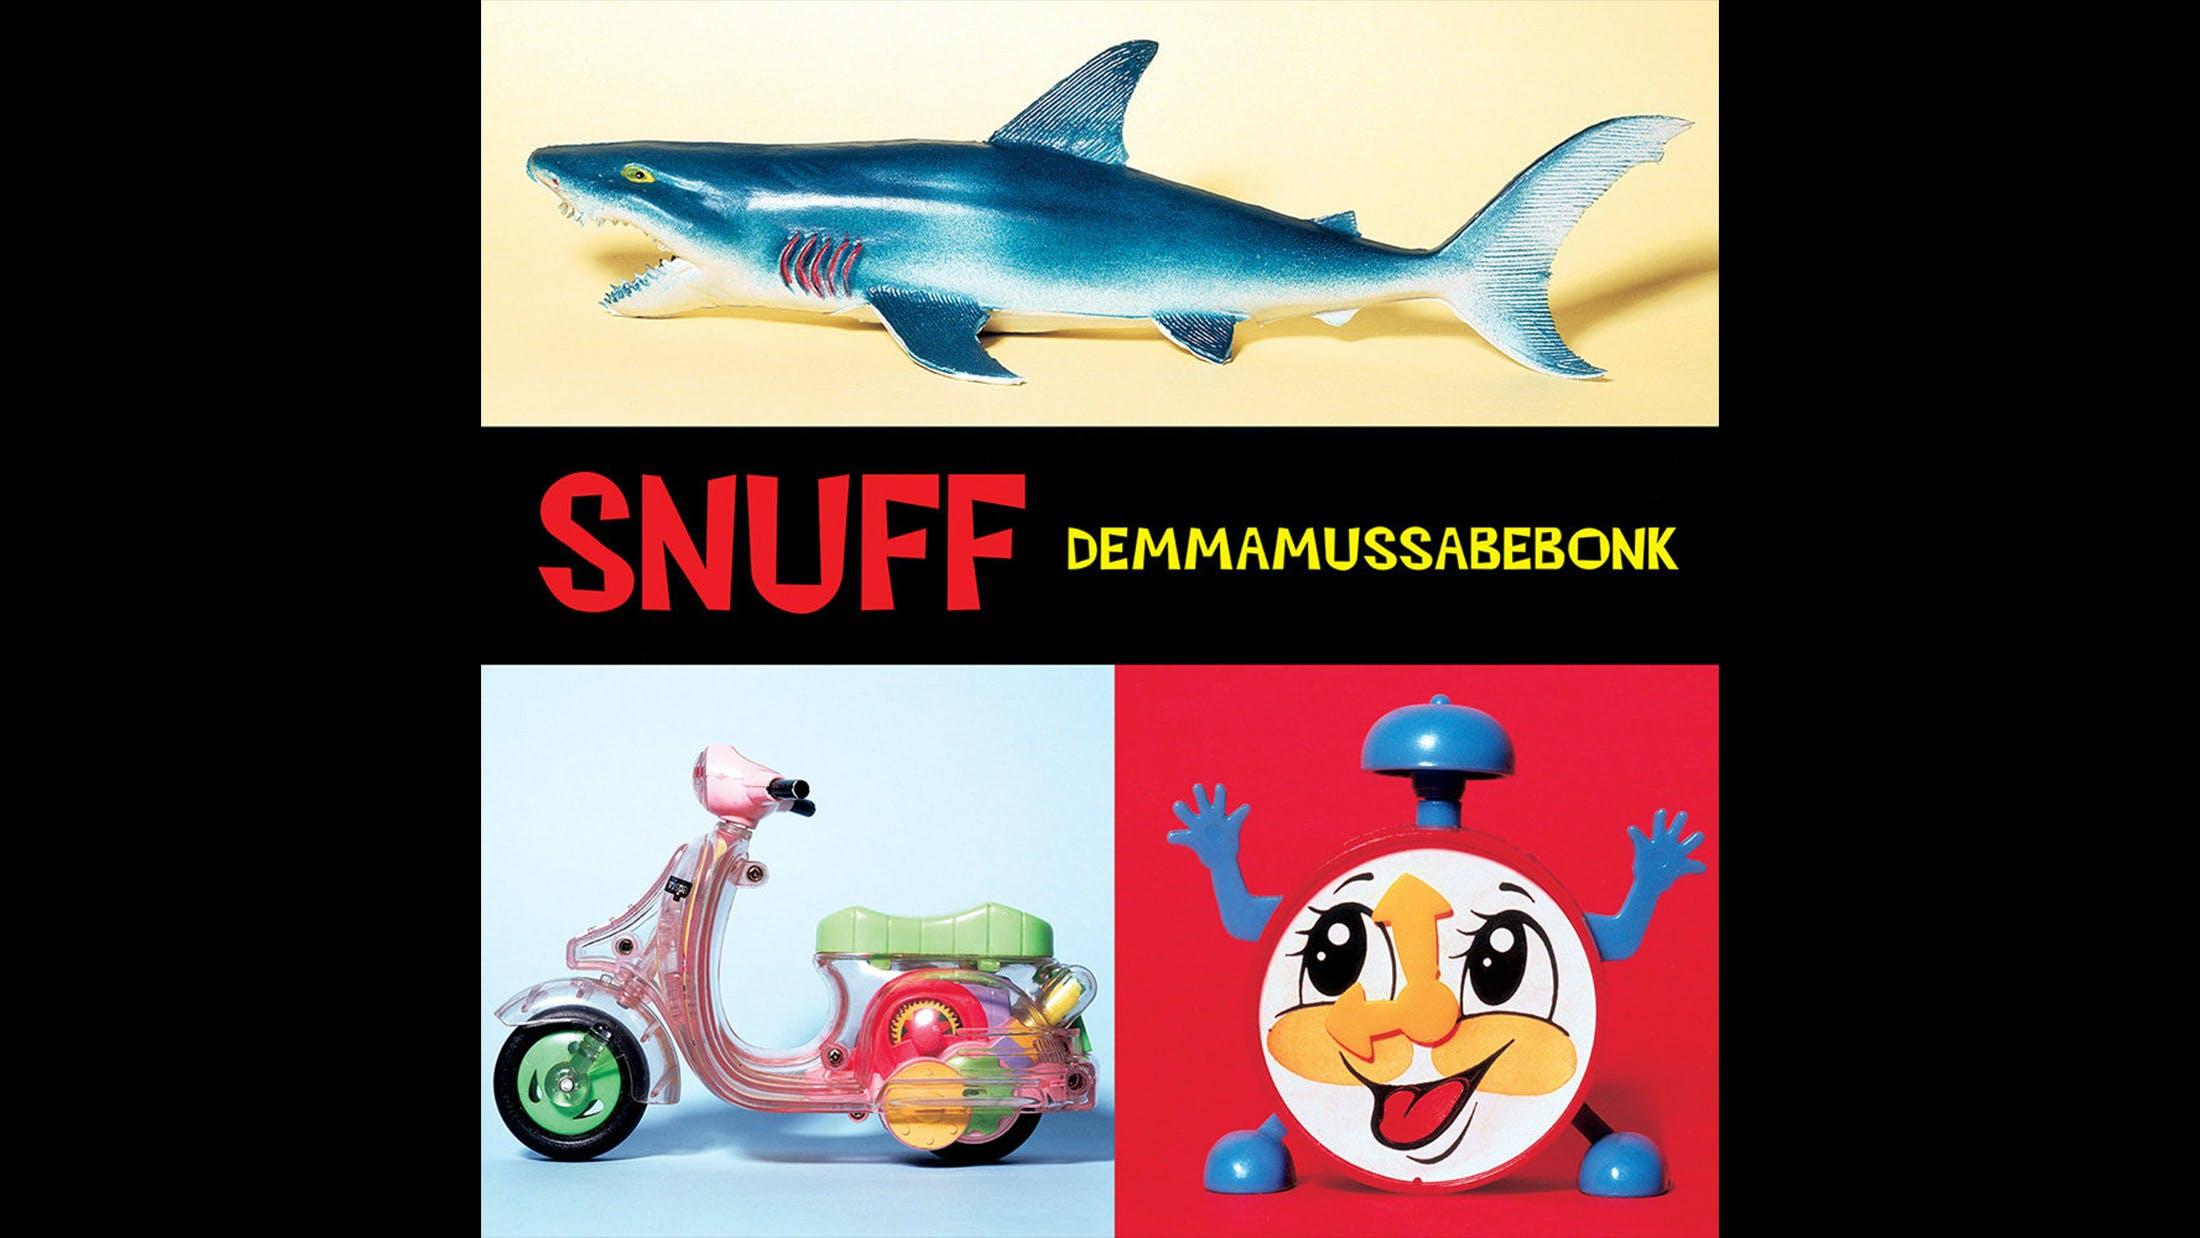 41. Snuff - Demmamussabebonk (1996)